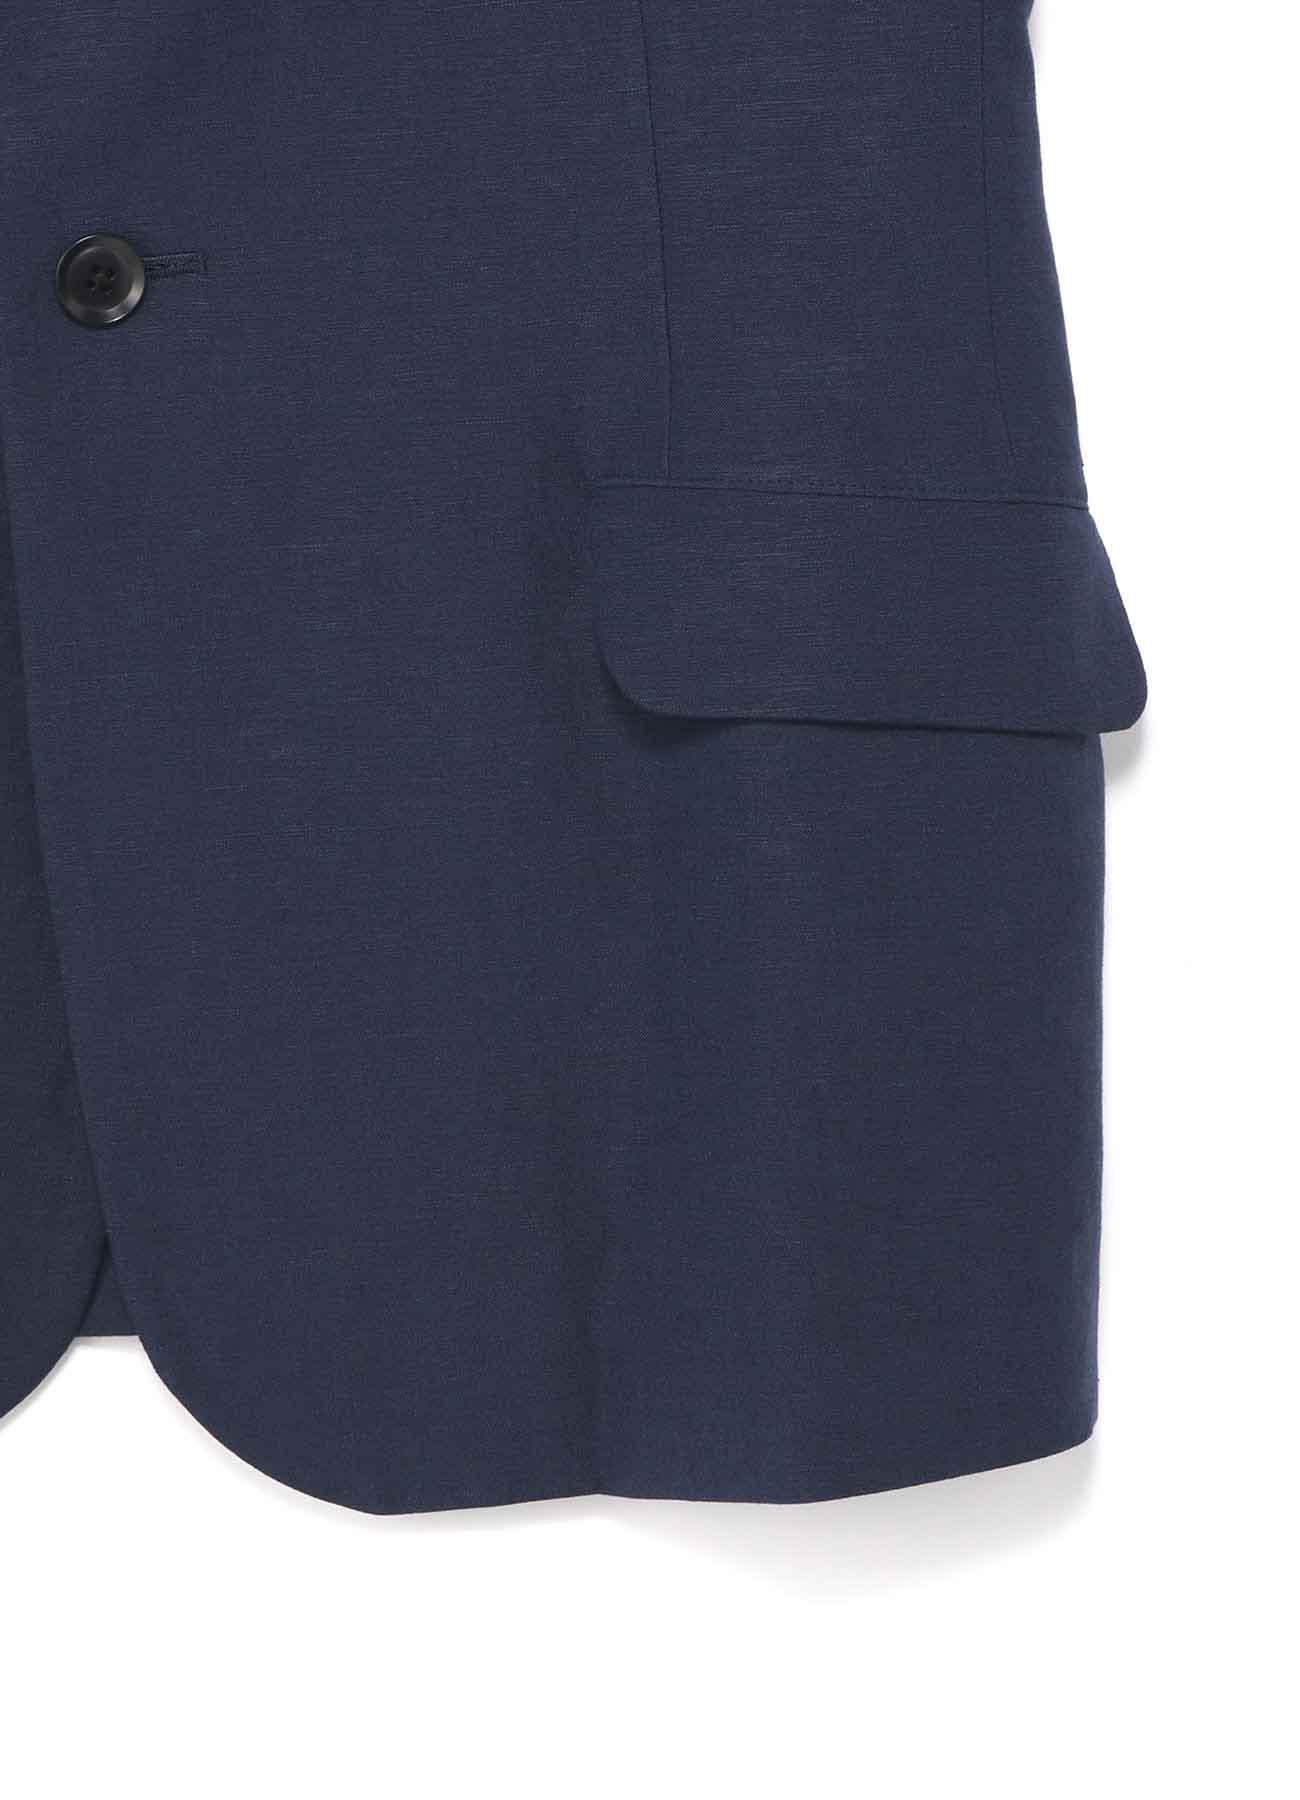 Rayon/Linen Bio Washer 2BS Slim Jacket